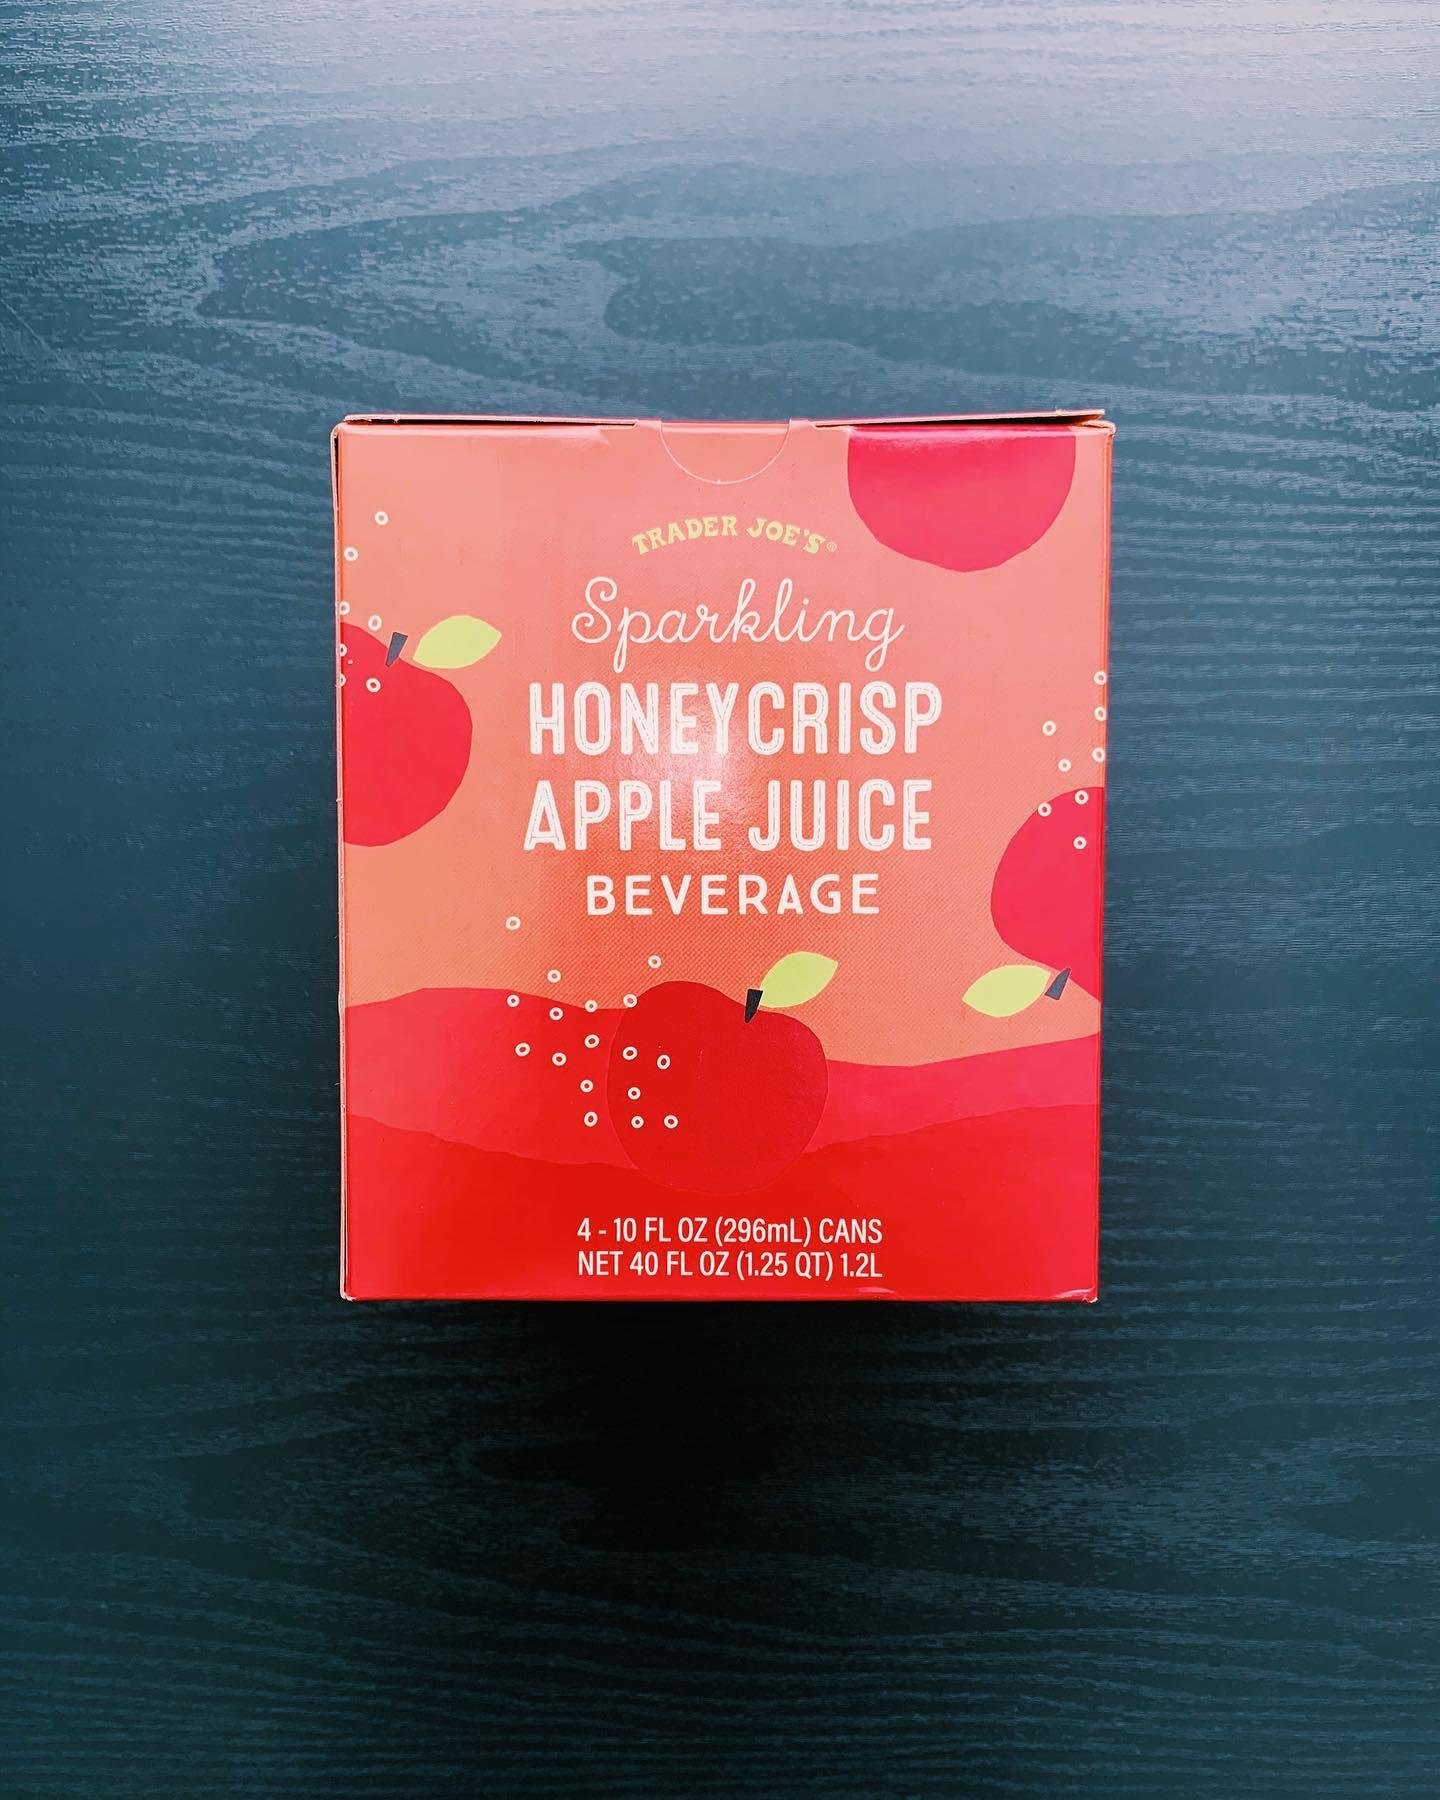 Sparkling Honeycrisp Apple Juice: 9/10